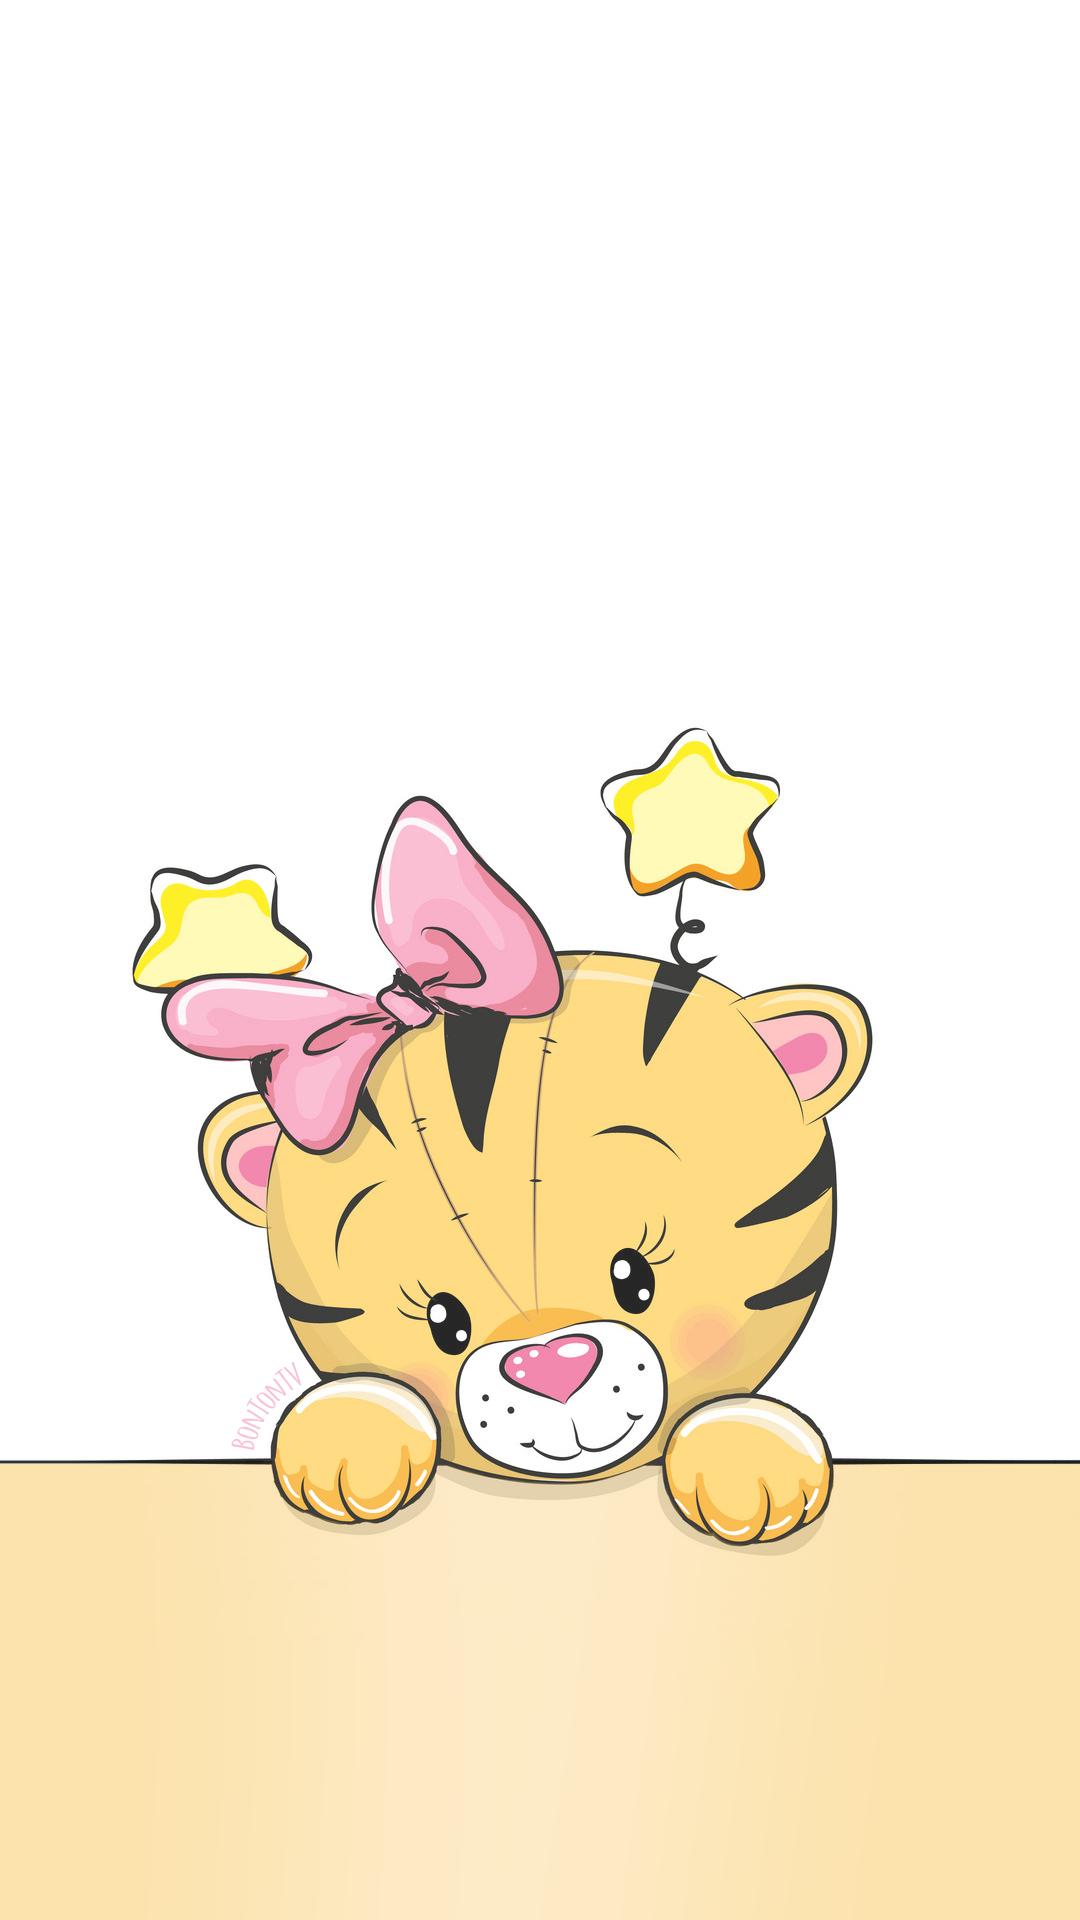 Phone Wallpapers Hd Cute Tiger By Bonton Tv Free Backgrounds 1080x1920 Wallpapers Iphone Smartphone Here You Ca Desenhos Lindos Desenhos Planos De Fundo